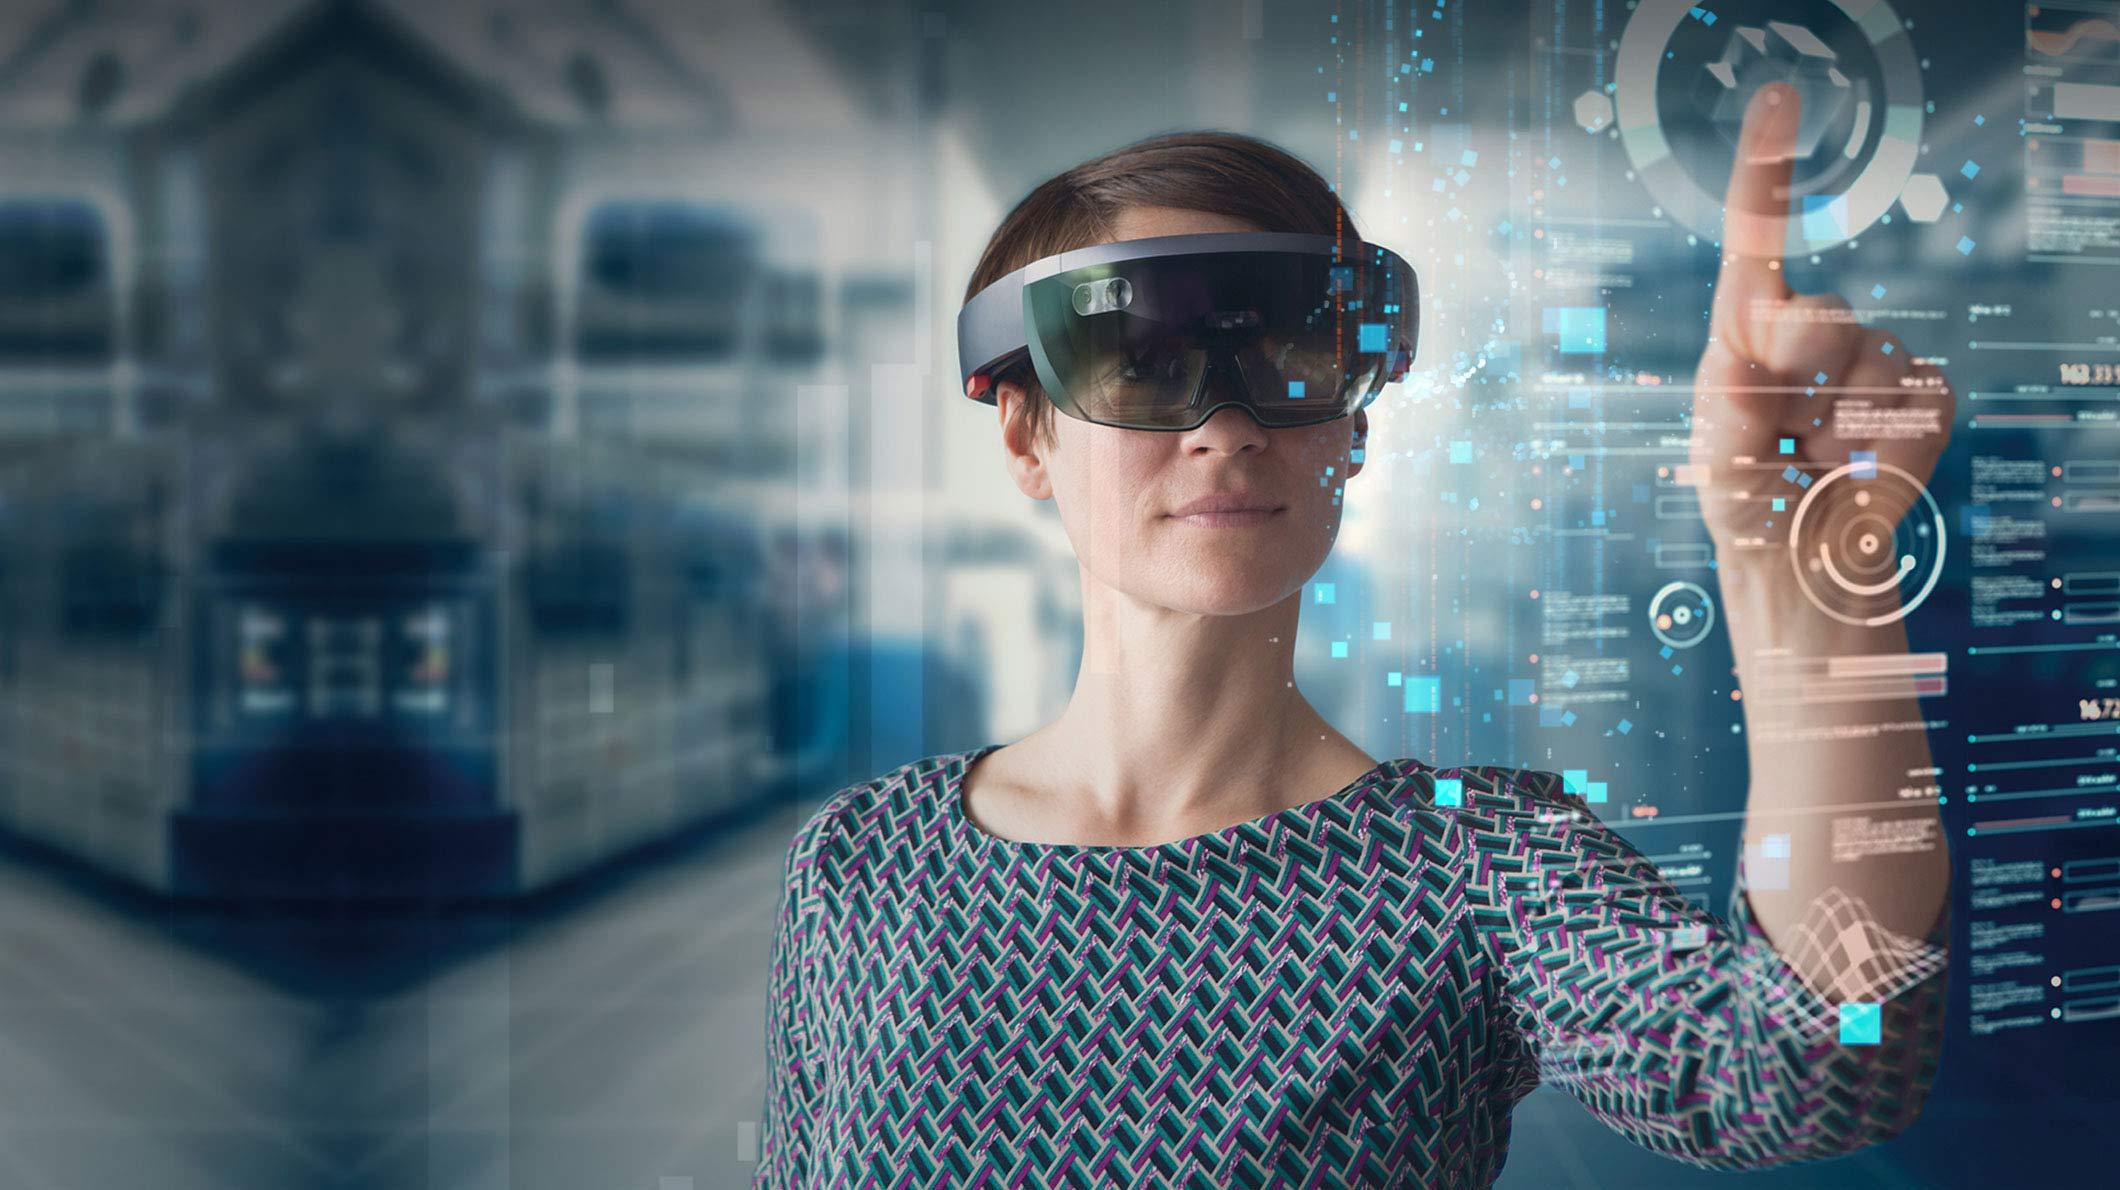 Femeie folosind HoloLens